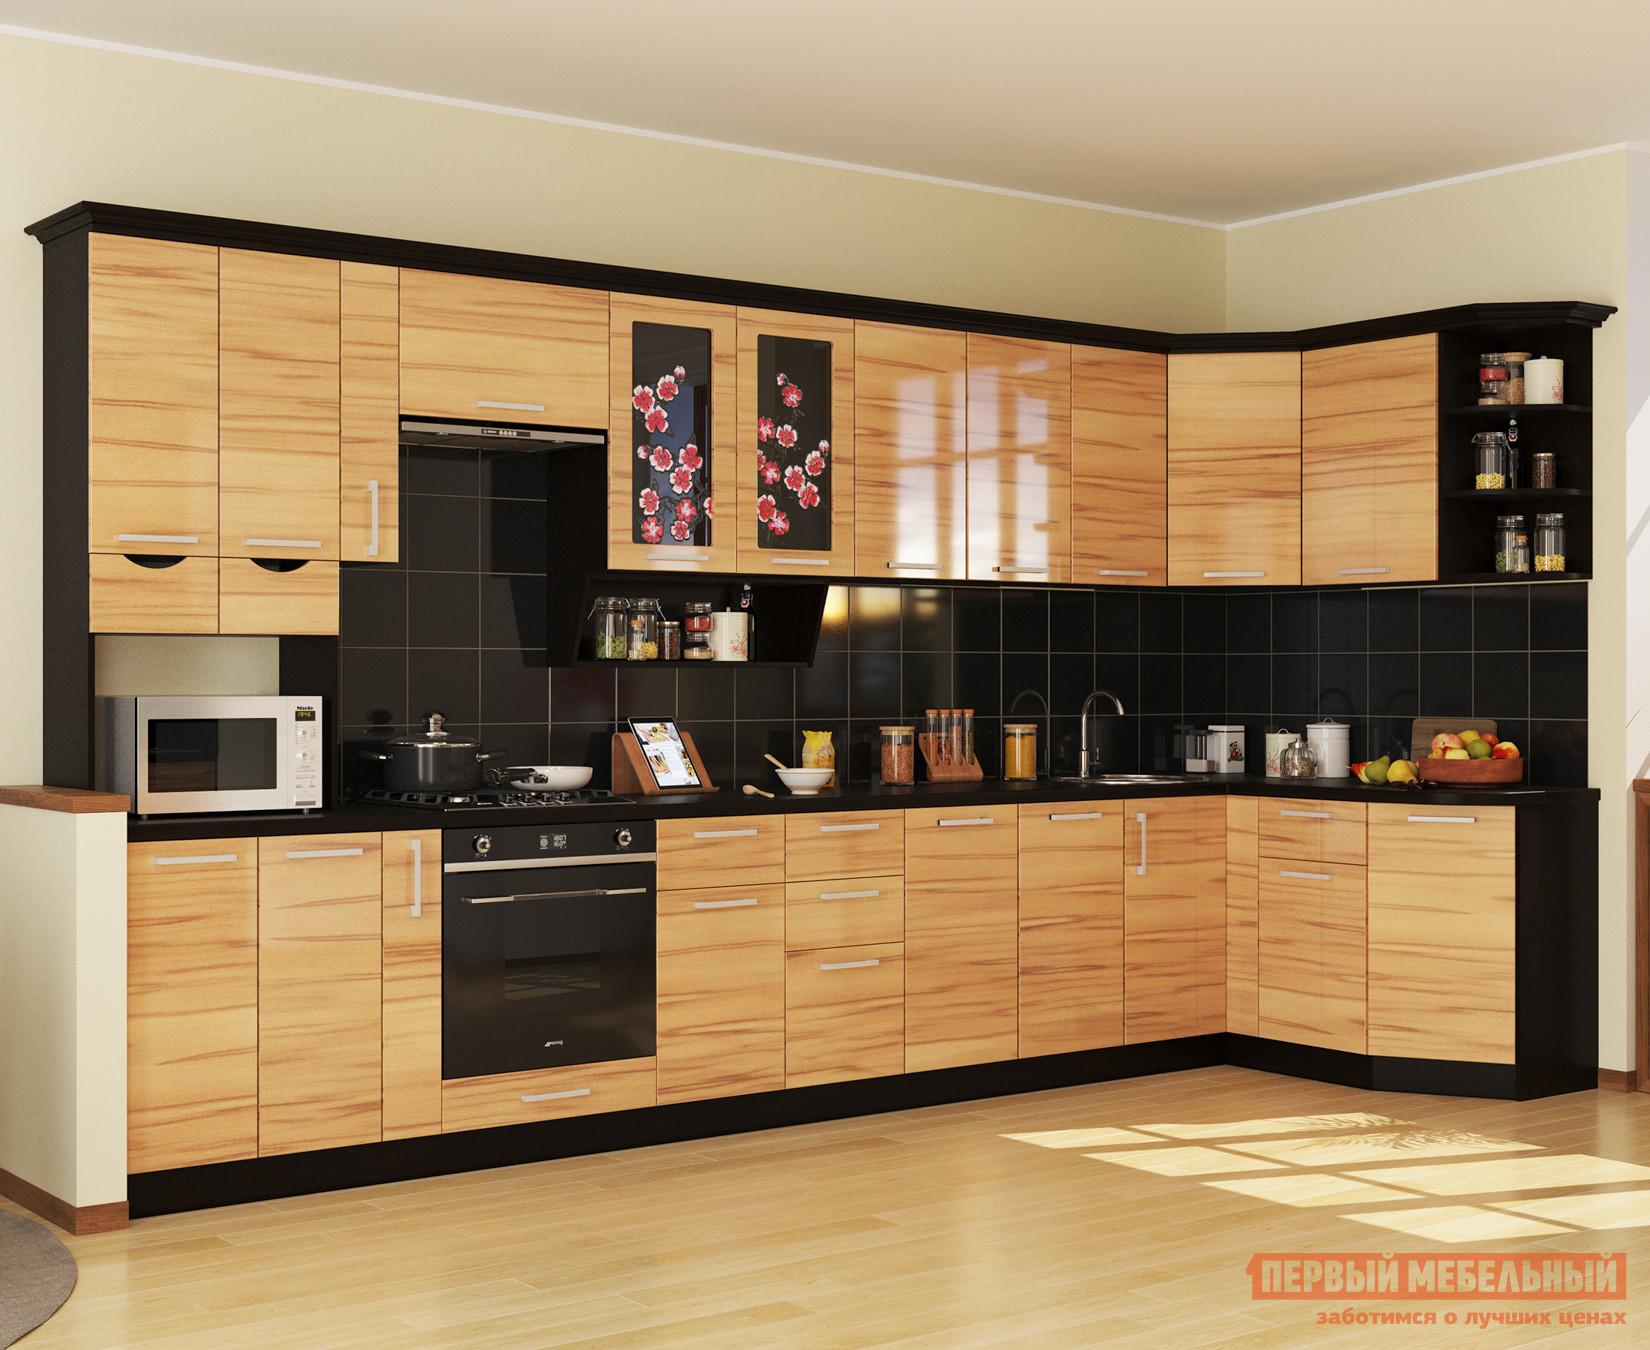 Кухонный гарнитур МО РОСТ Сакура Угол 5 кухонный гарнитур трия фэнтези 120 см